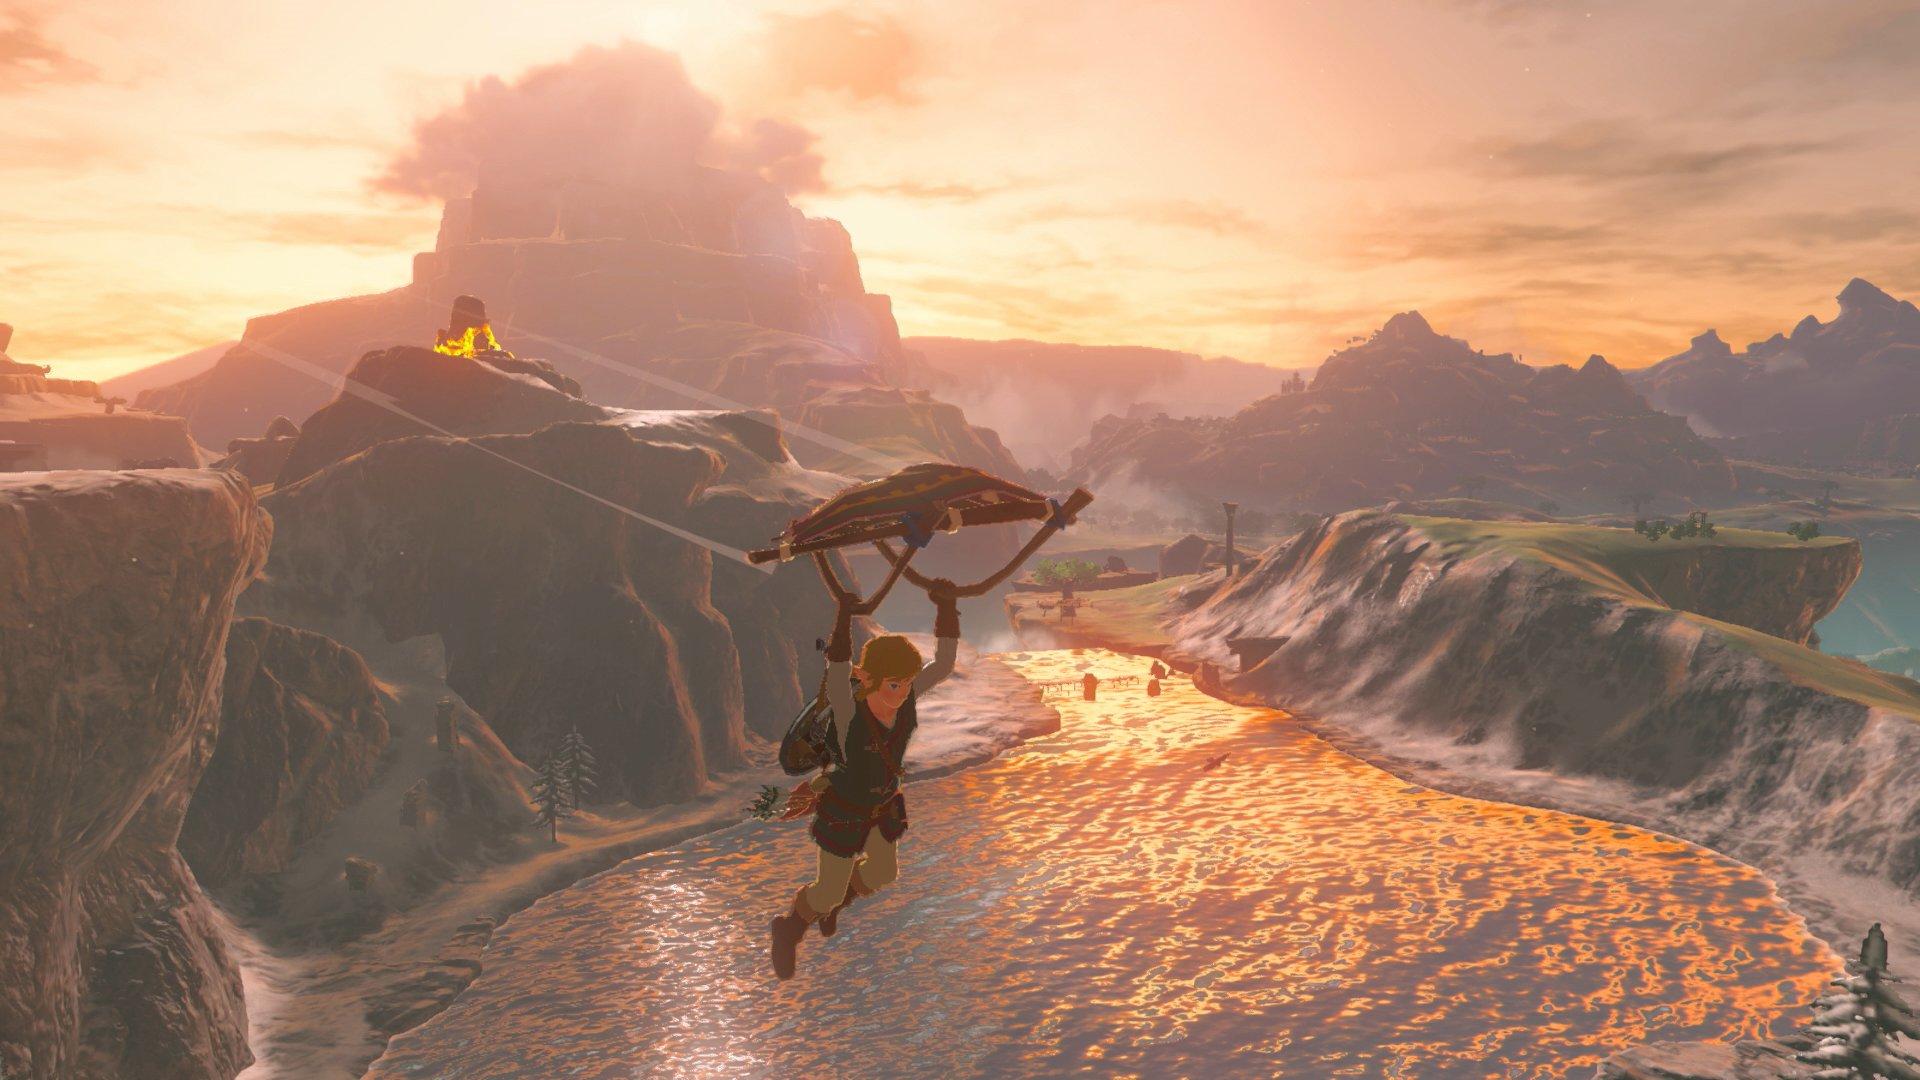 Nové screenshoty z The Legend of Zelda: Breath of the Wild 139297